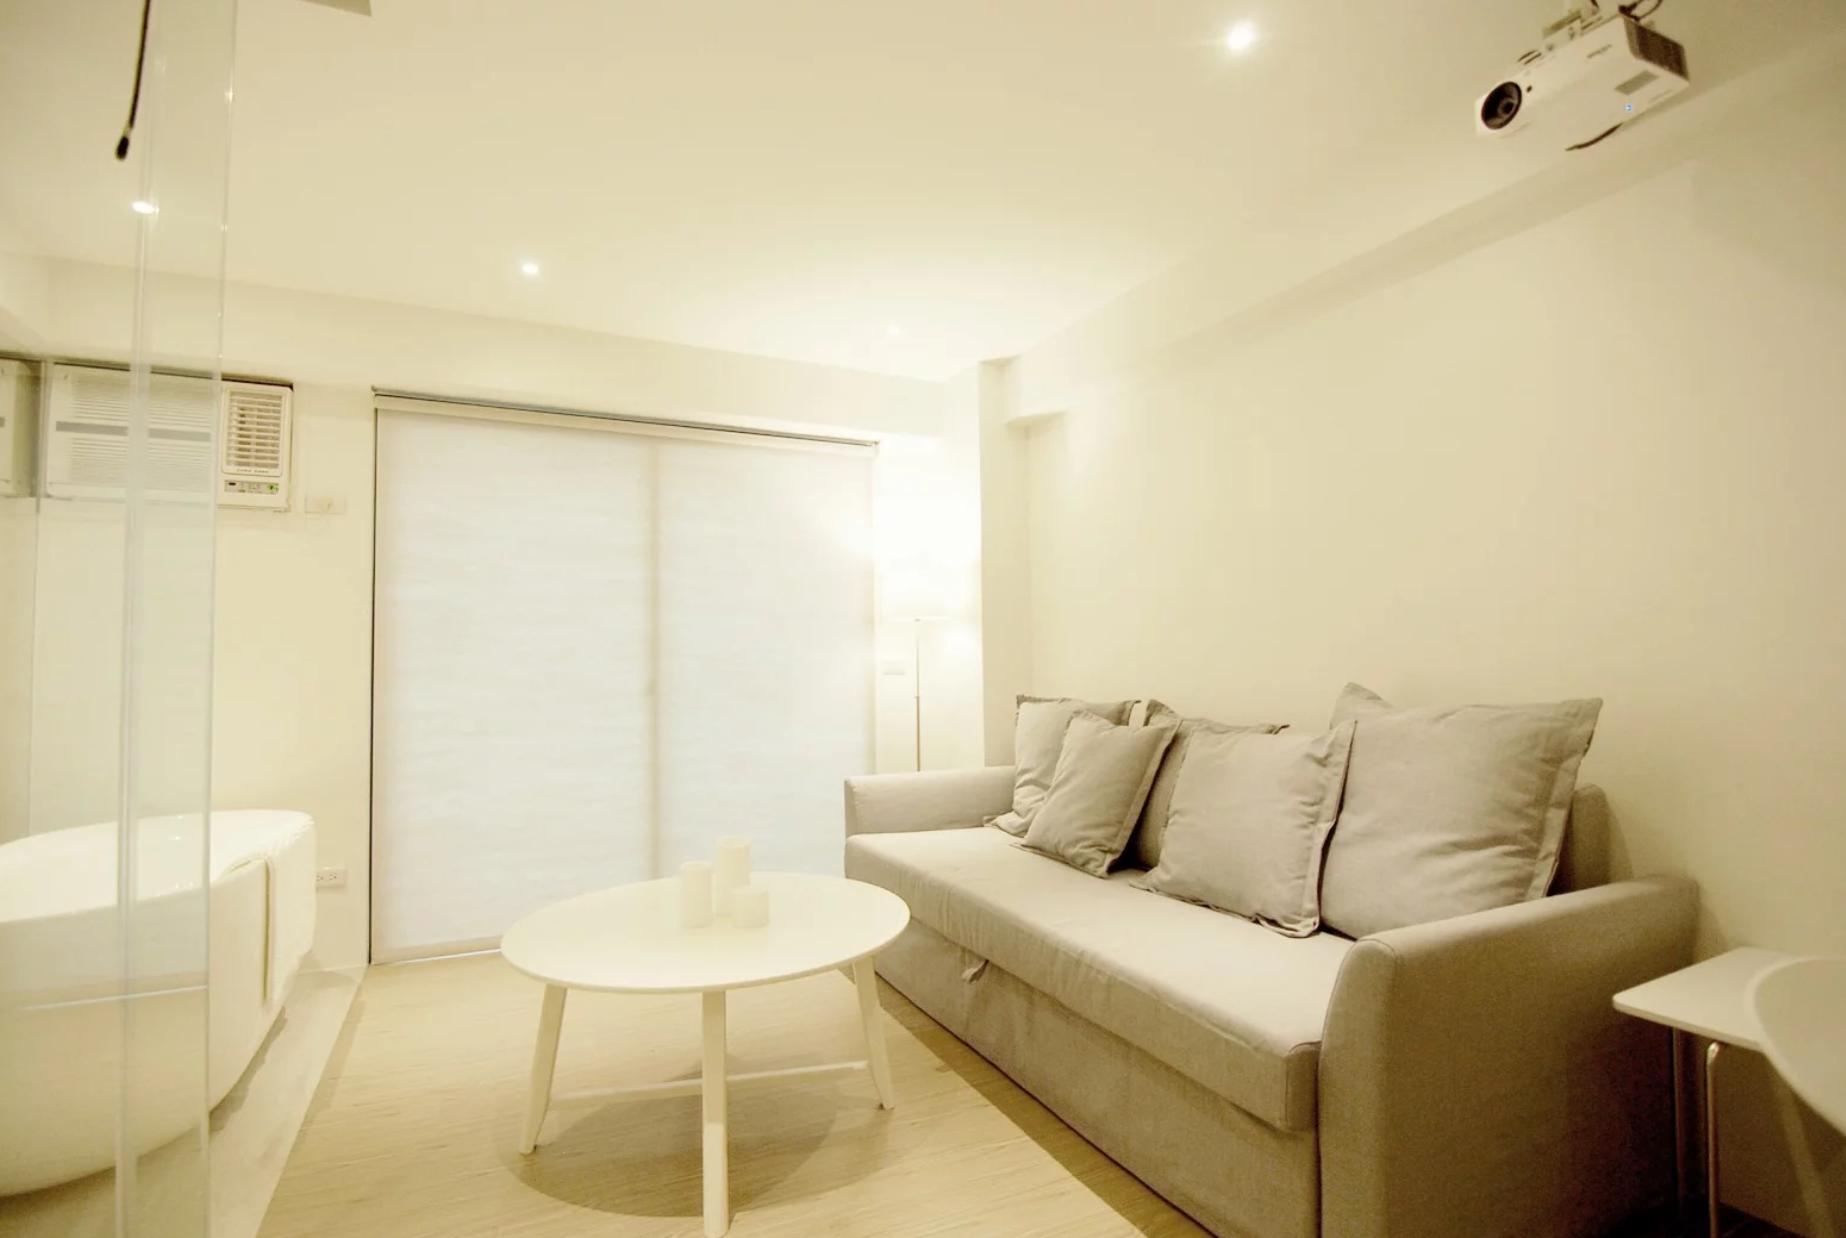 德築-DEZU-project-礁溪套房裝修-architecture-interior-renovation-12